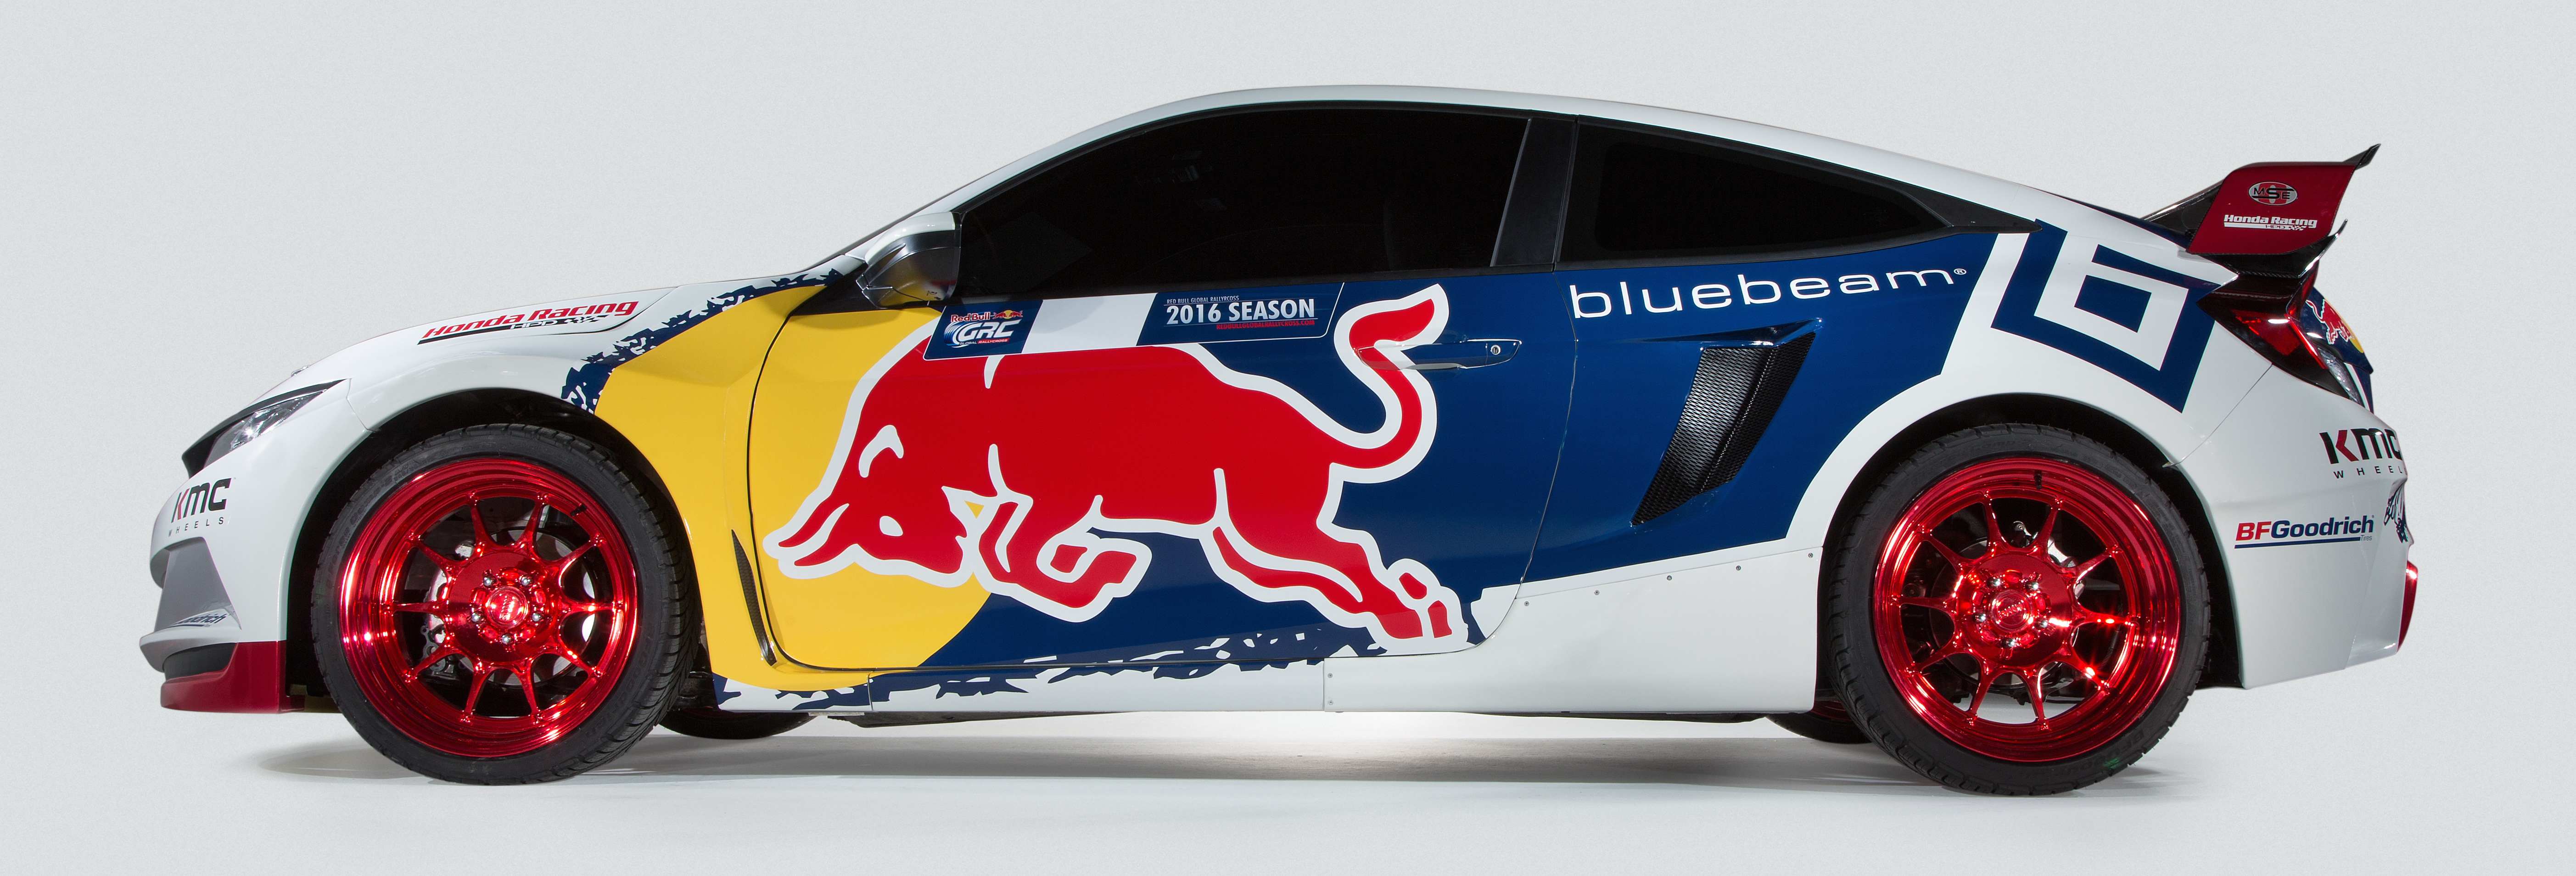 Grc Civic >> 2016 Honda Civic Red Bull Global Rallycross unveiled Image 464854